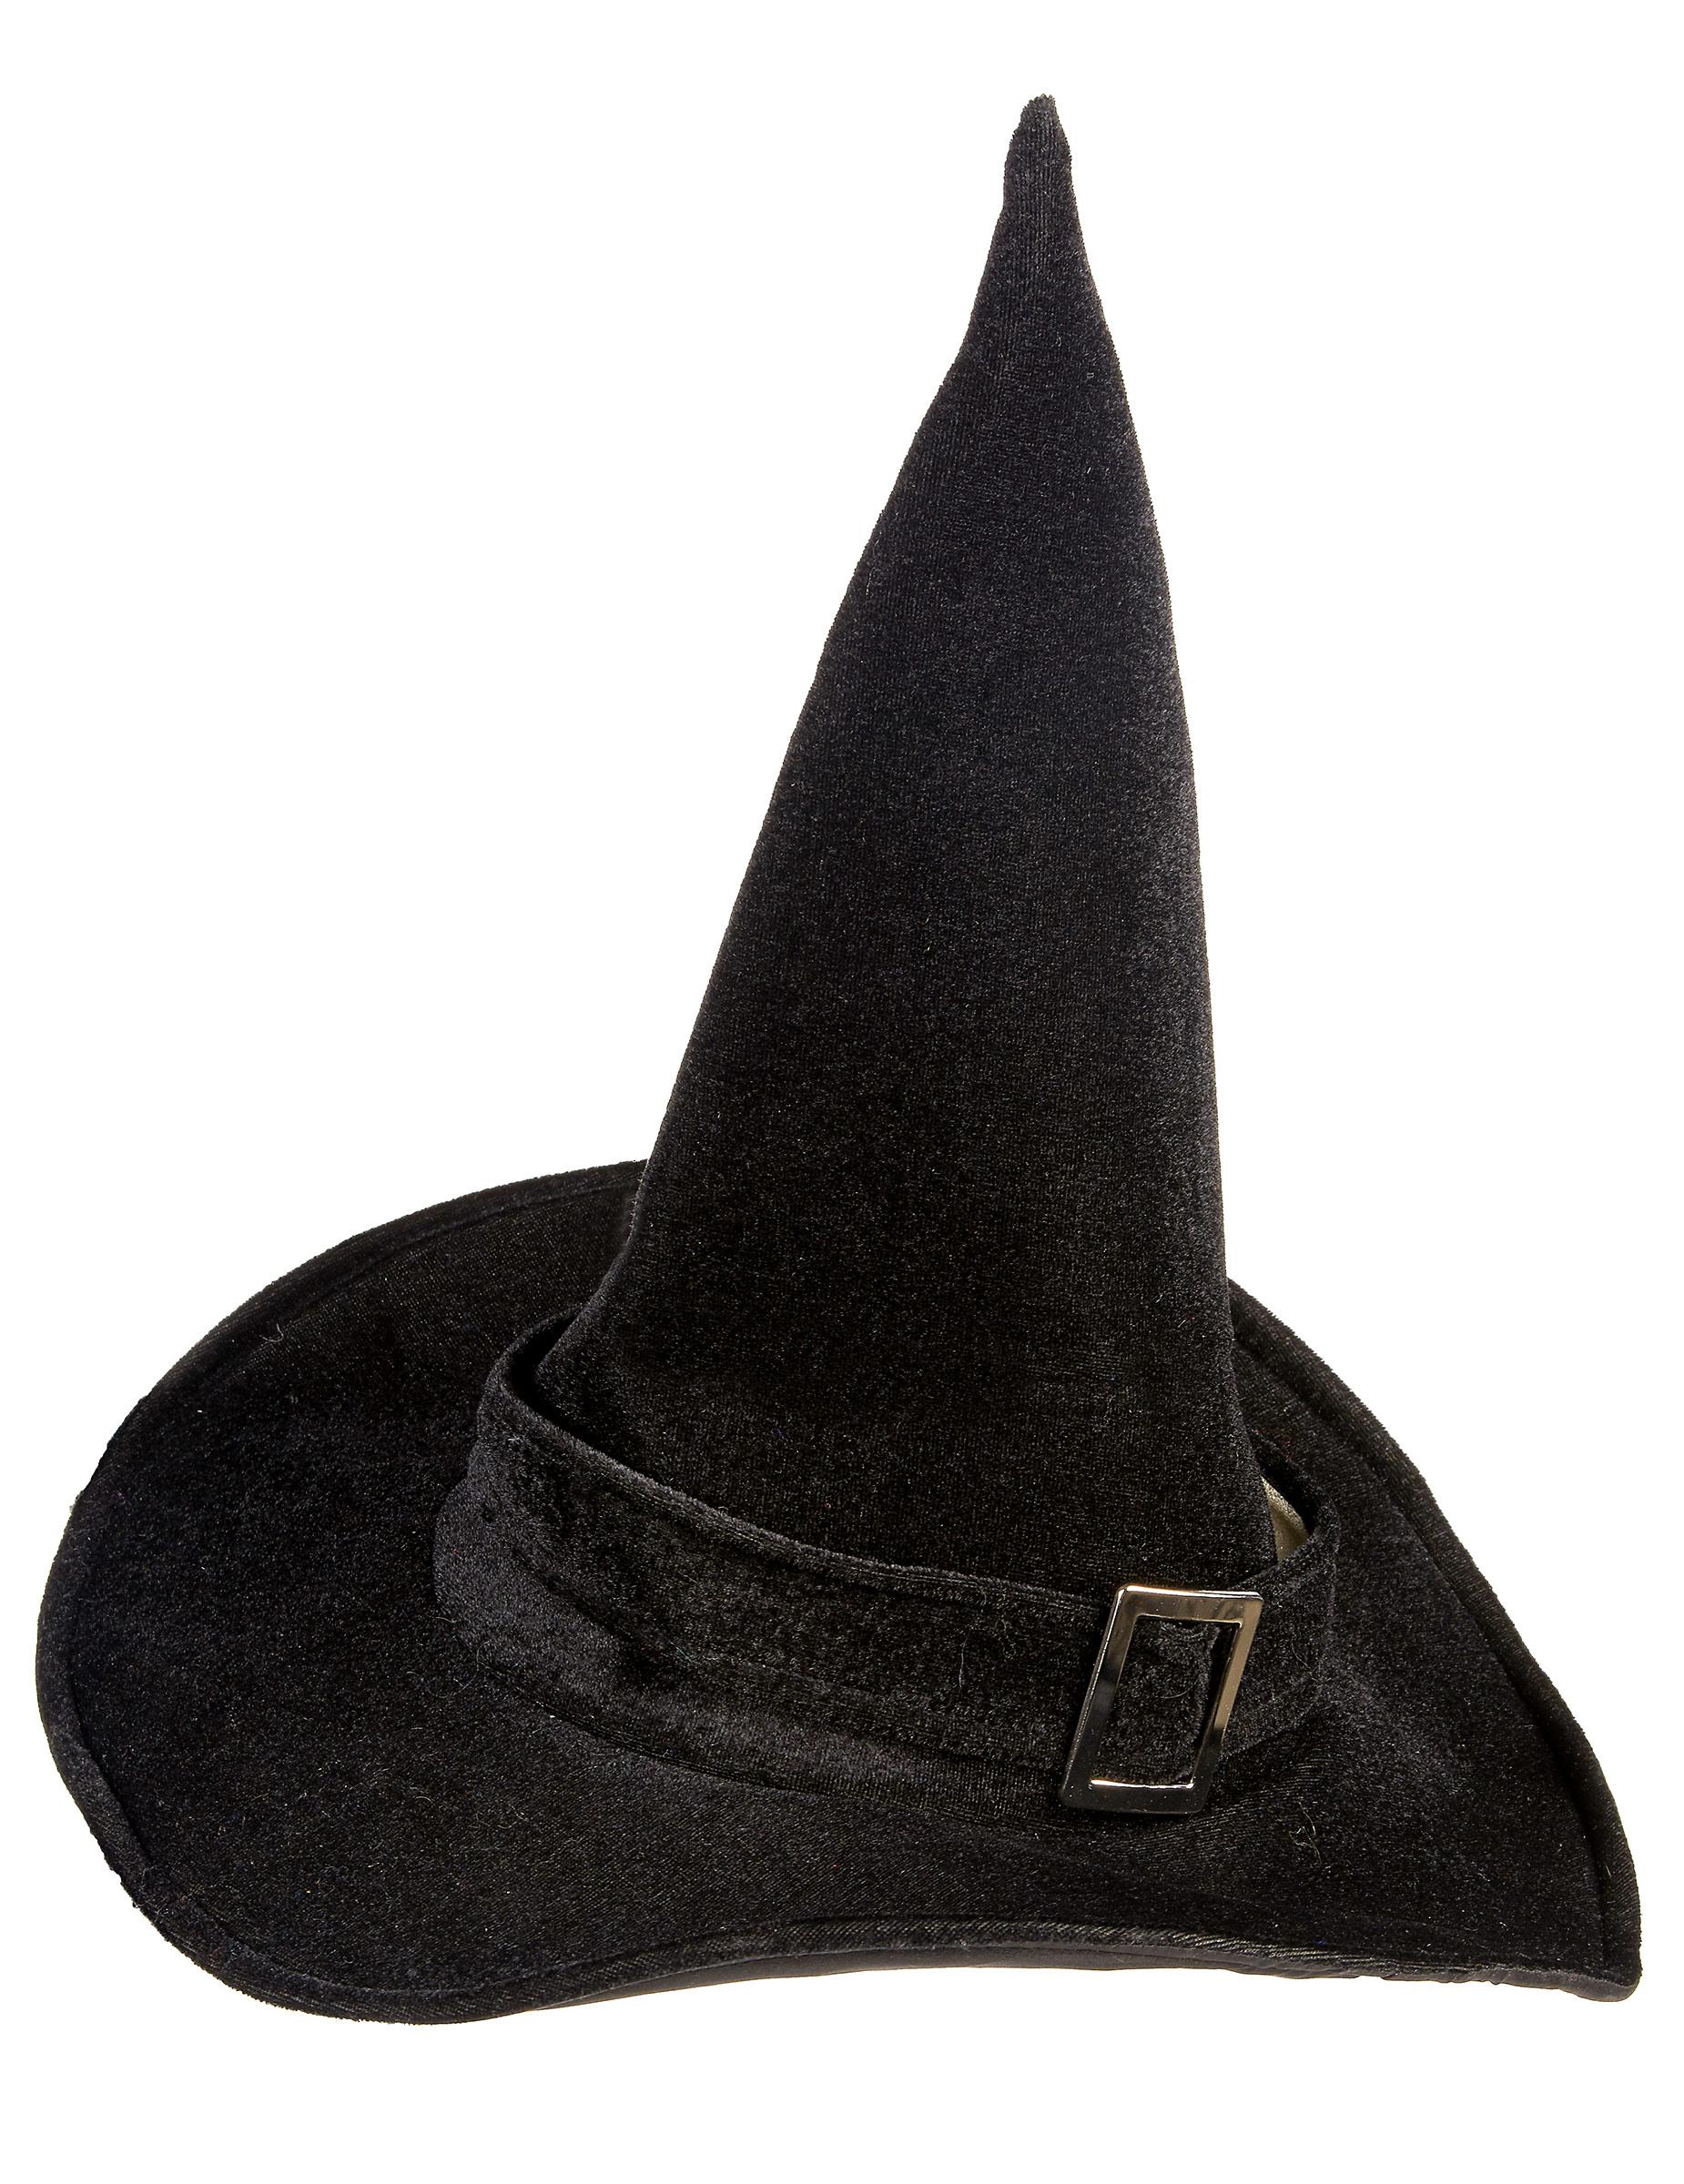 Sombrero de bruja de terciopelo para mujer ideal para Halloween-1 374636b8fb9